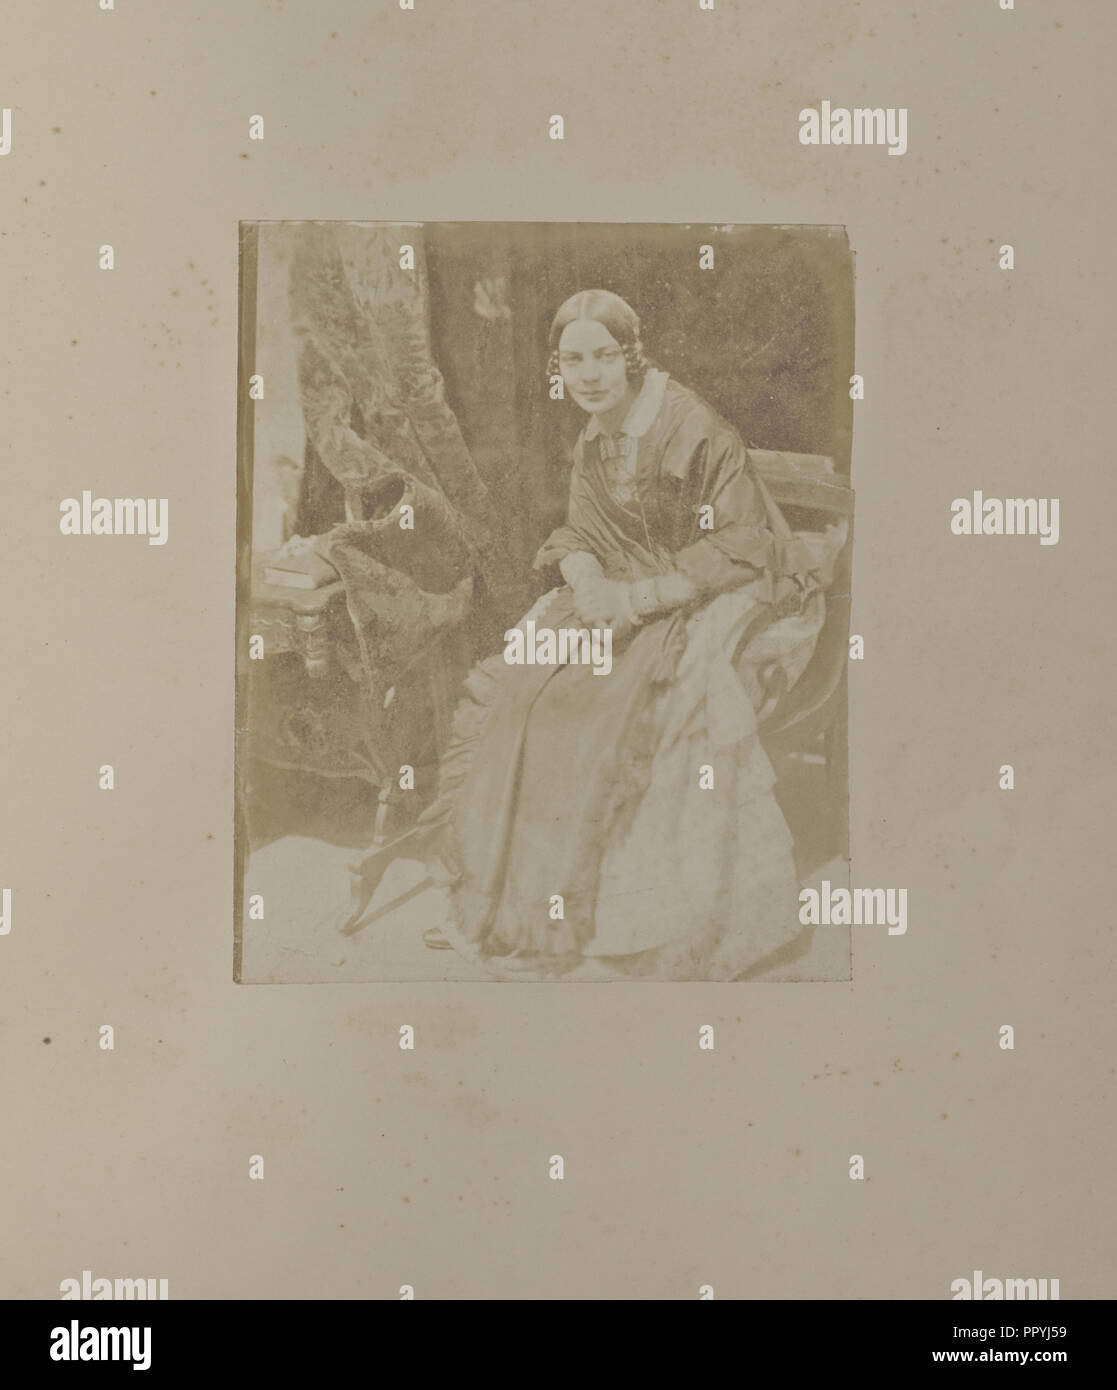 Mrs Matilda, Rigby, Smith; Hill & Adamson, Scottish, active 1843 - 1848, Scotland; 1843 - 1846; Salted paper print Stock Photo